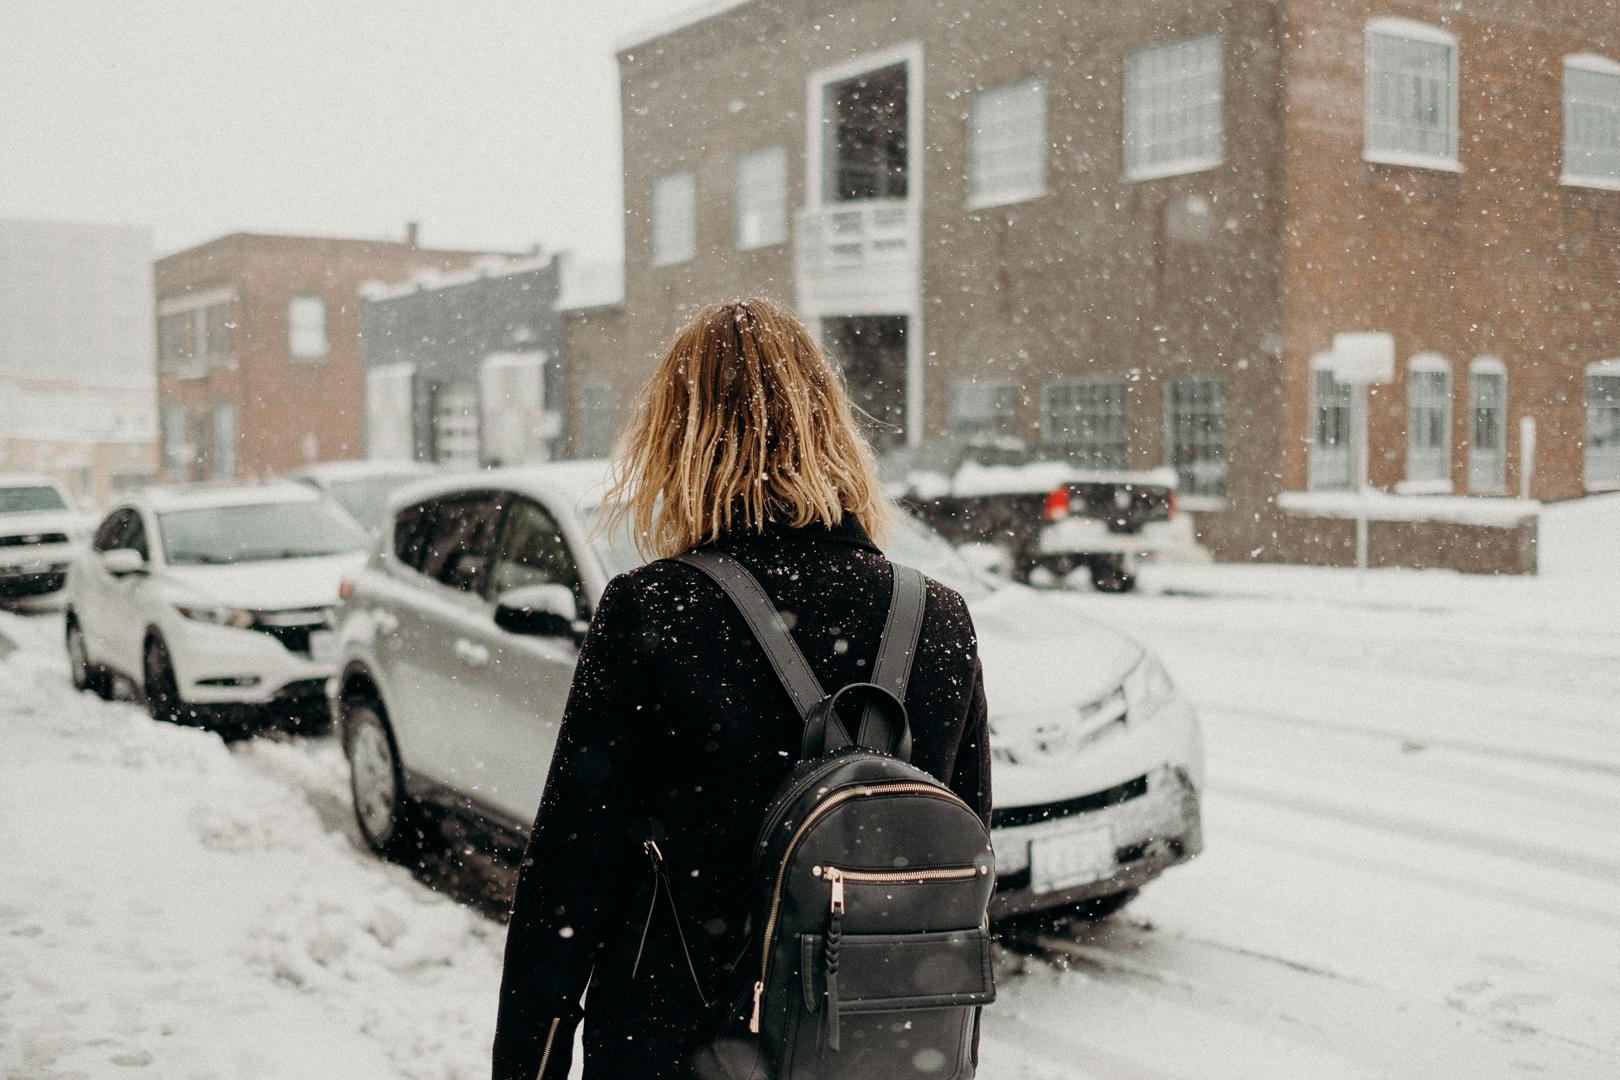 20190112_snowydaysin_kansascity_alihapperphoto_3.jpg